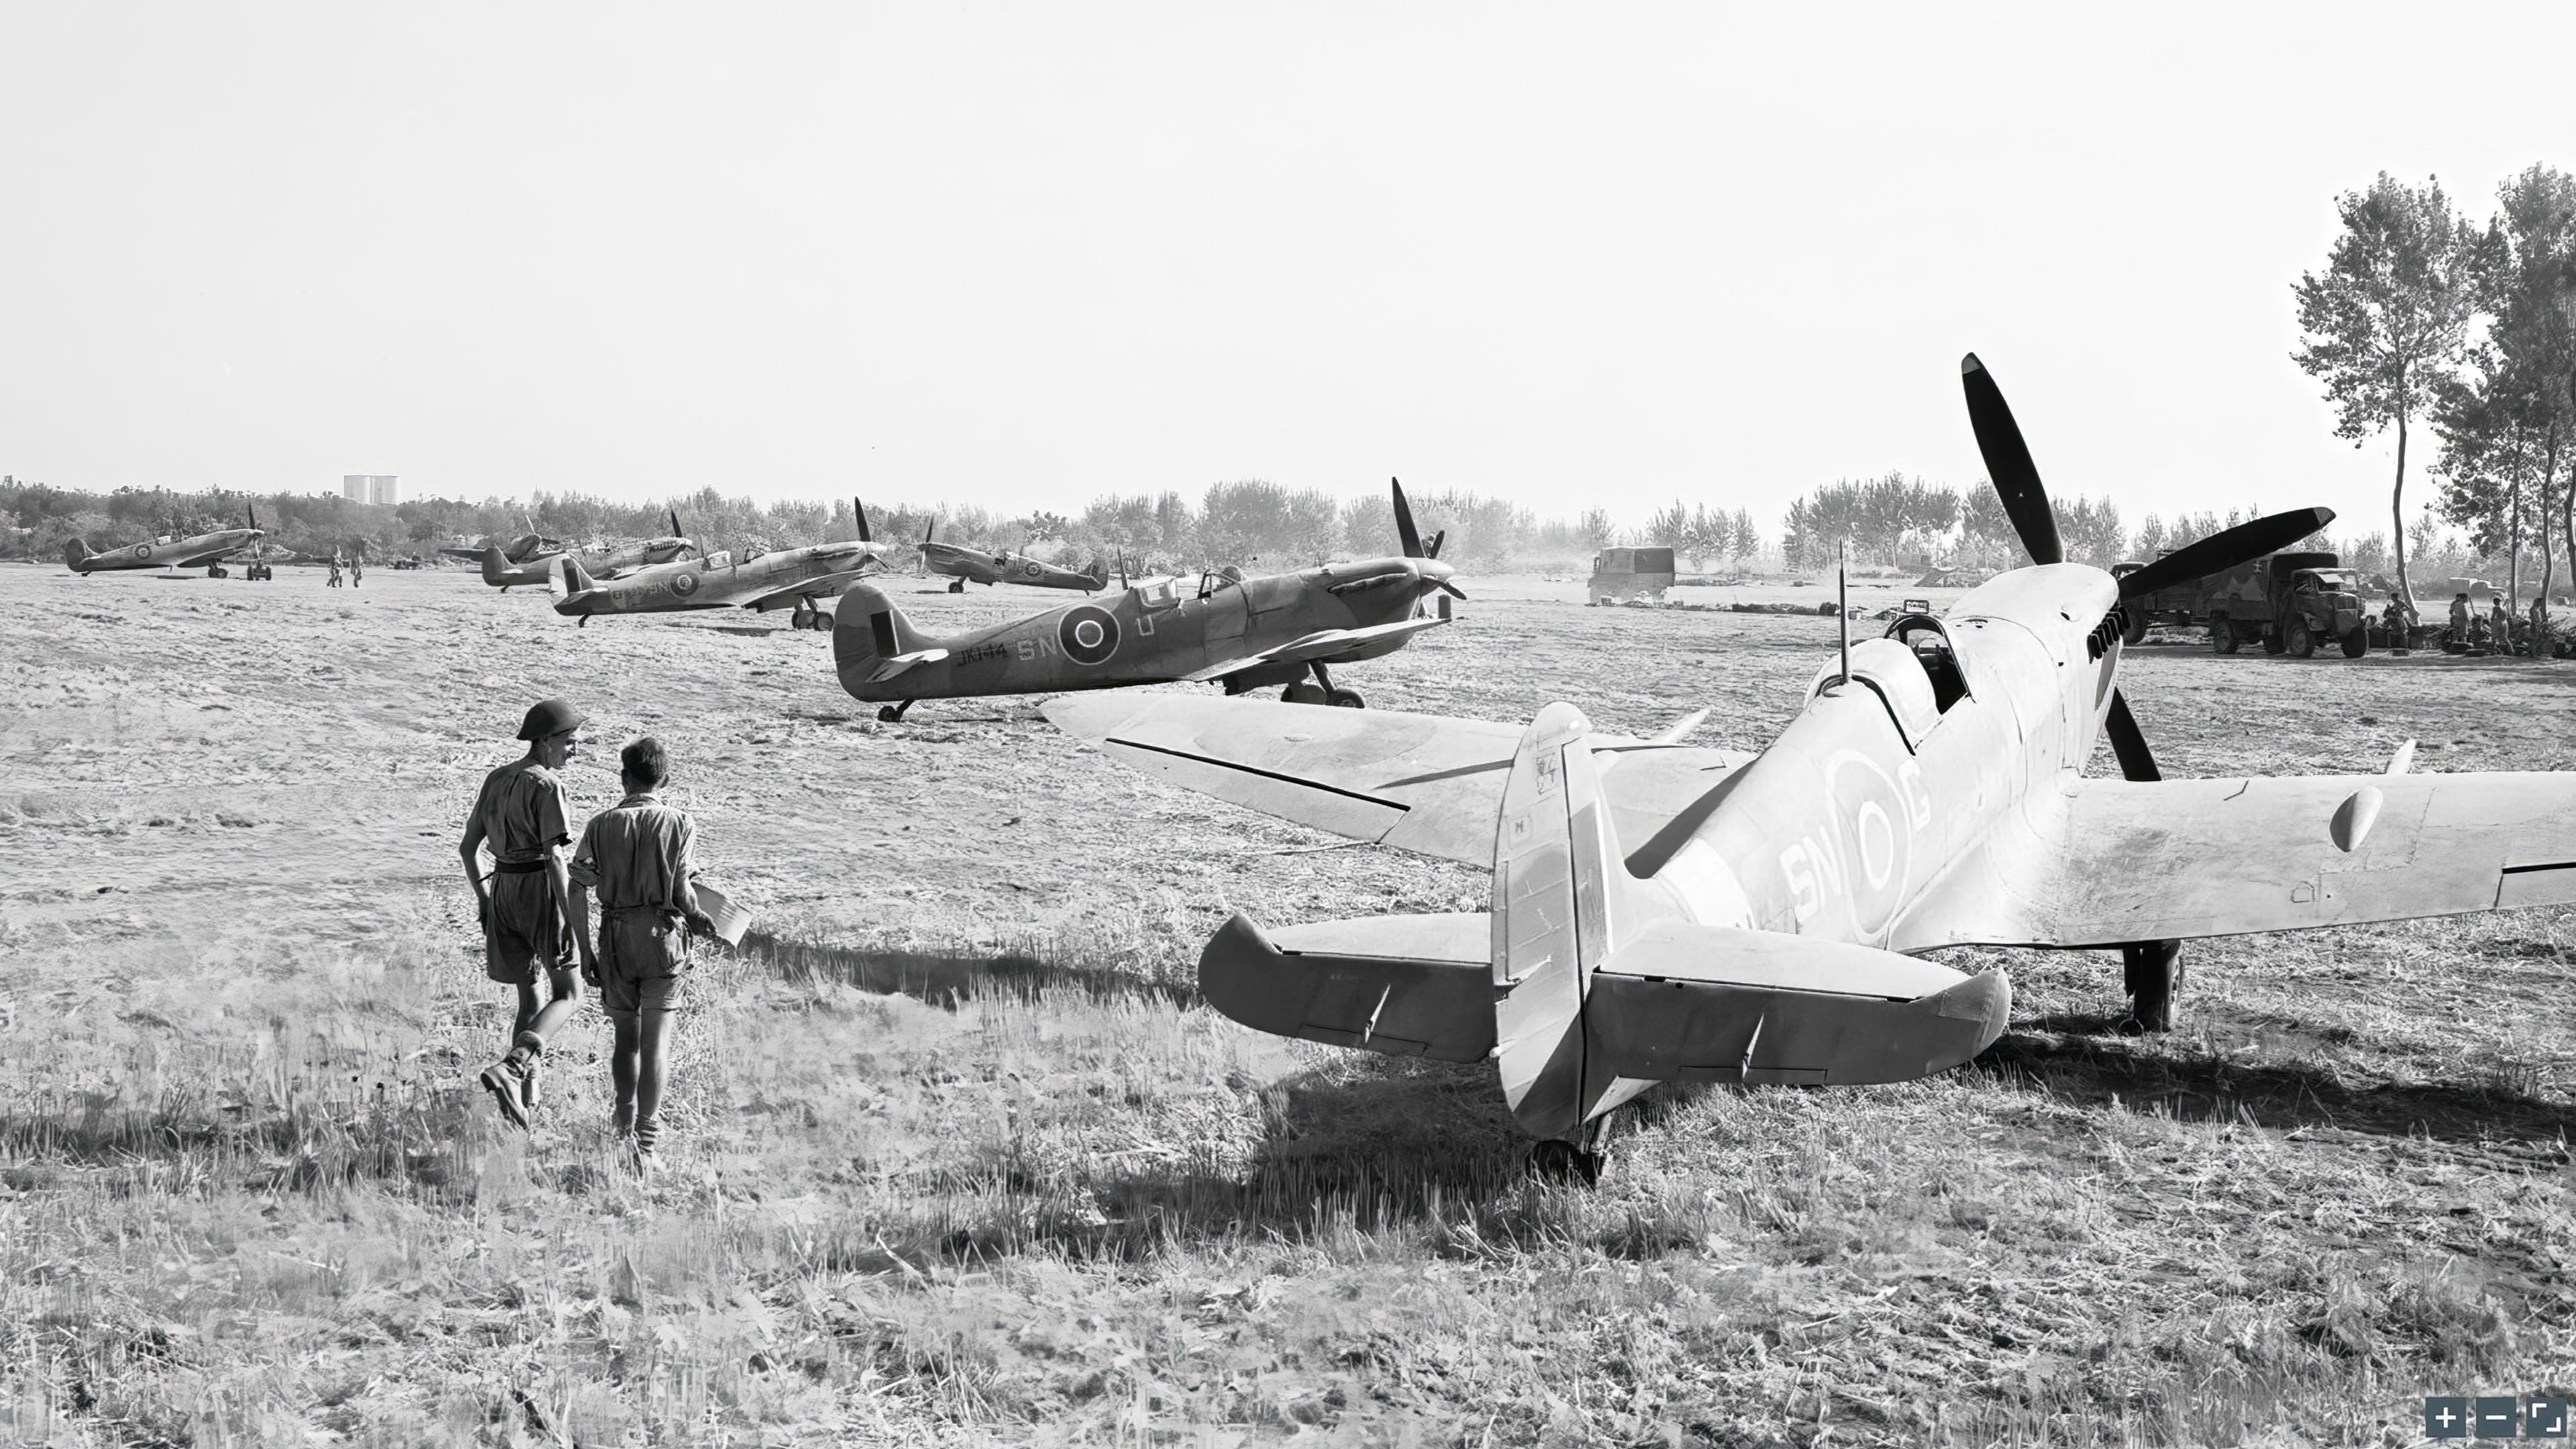 Spitfire Vc RAF 243Sqn SNG SNU JK144 at Tusciano landing ground Salerno IWM CNA1425a